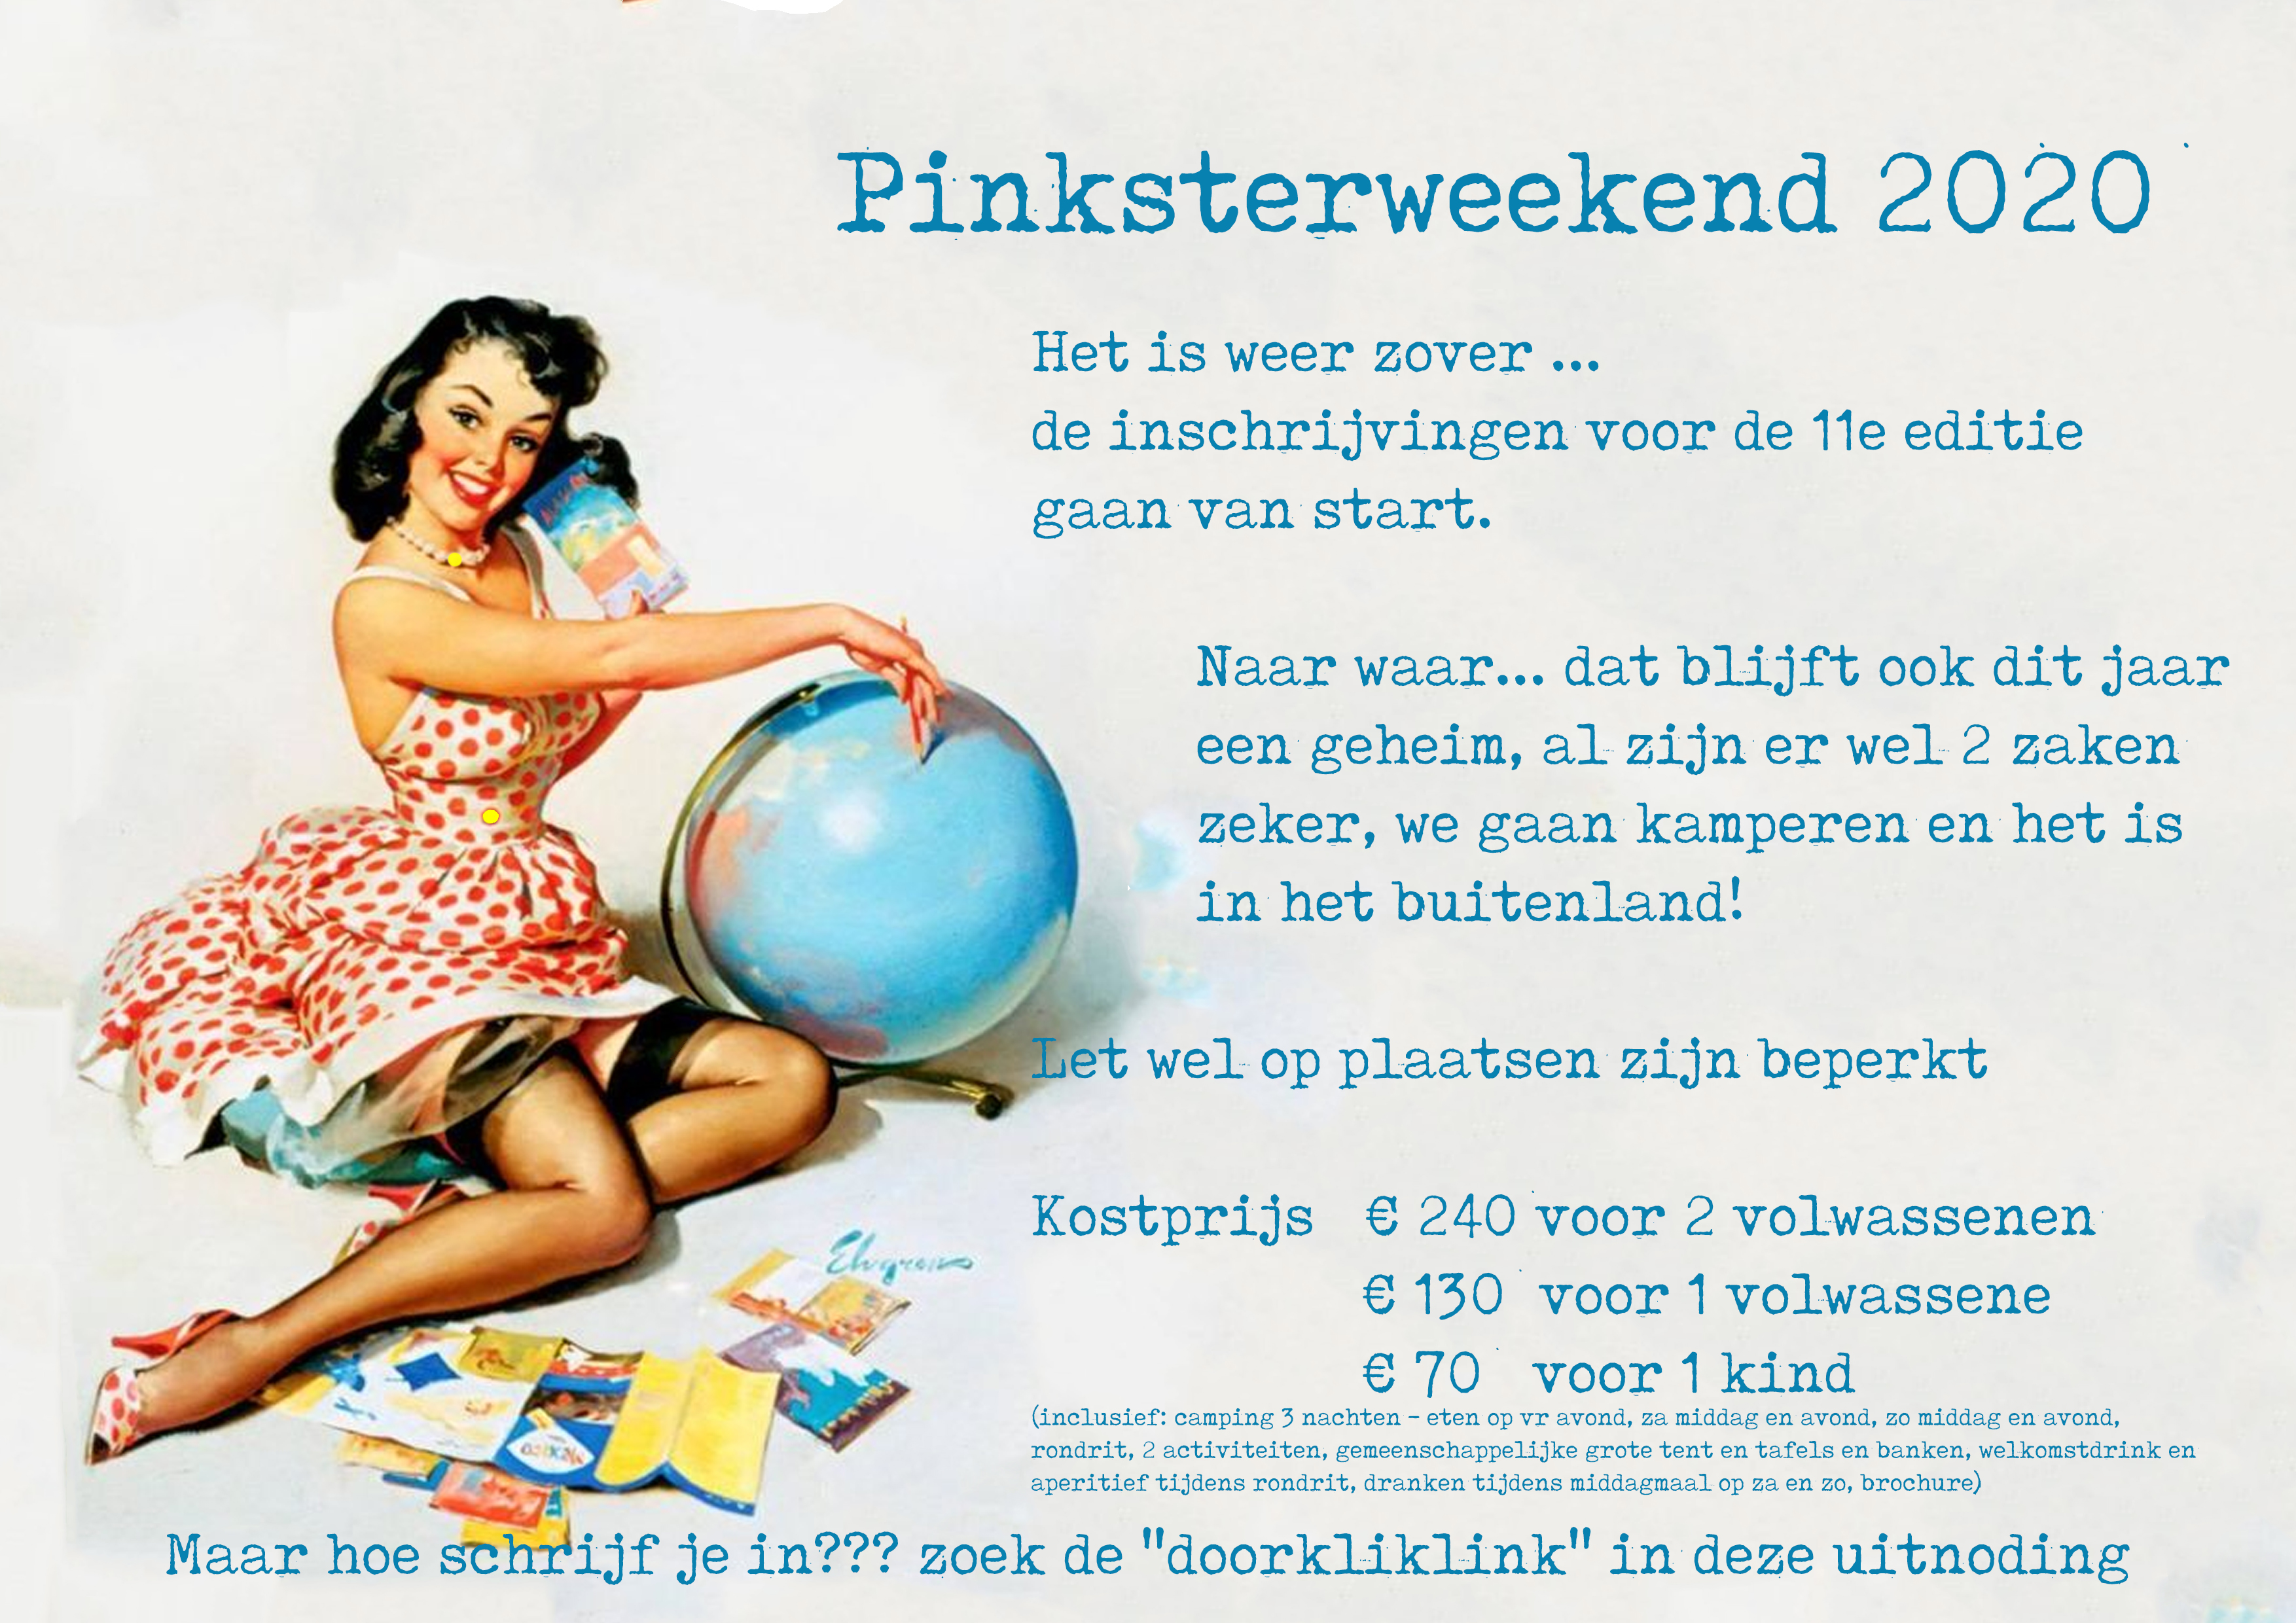 Pinksterweekend 2020